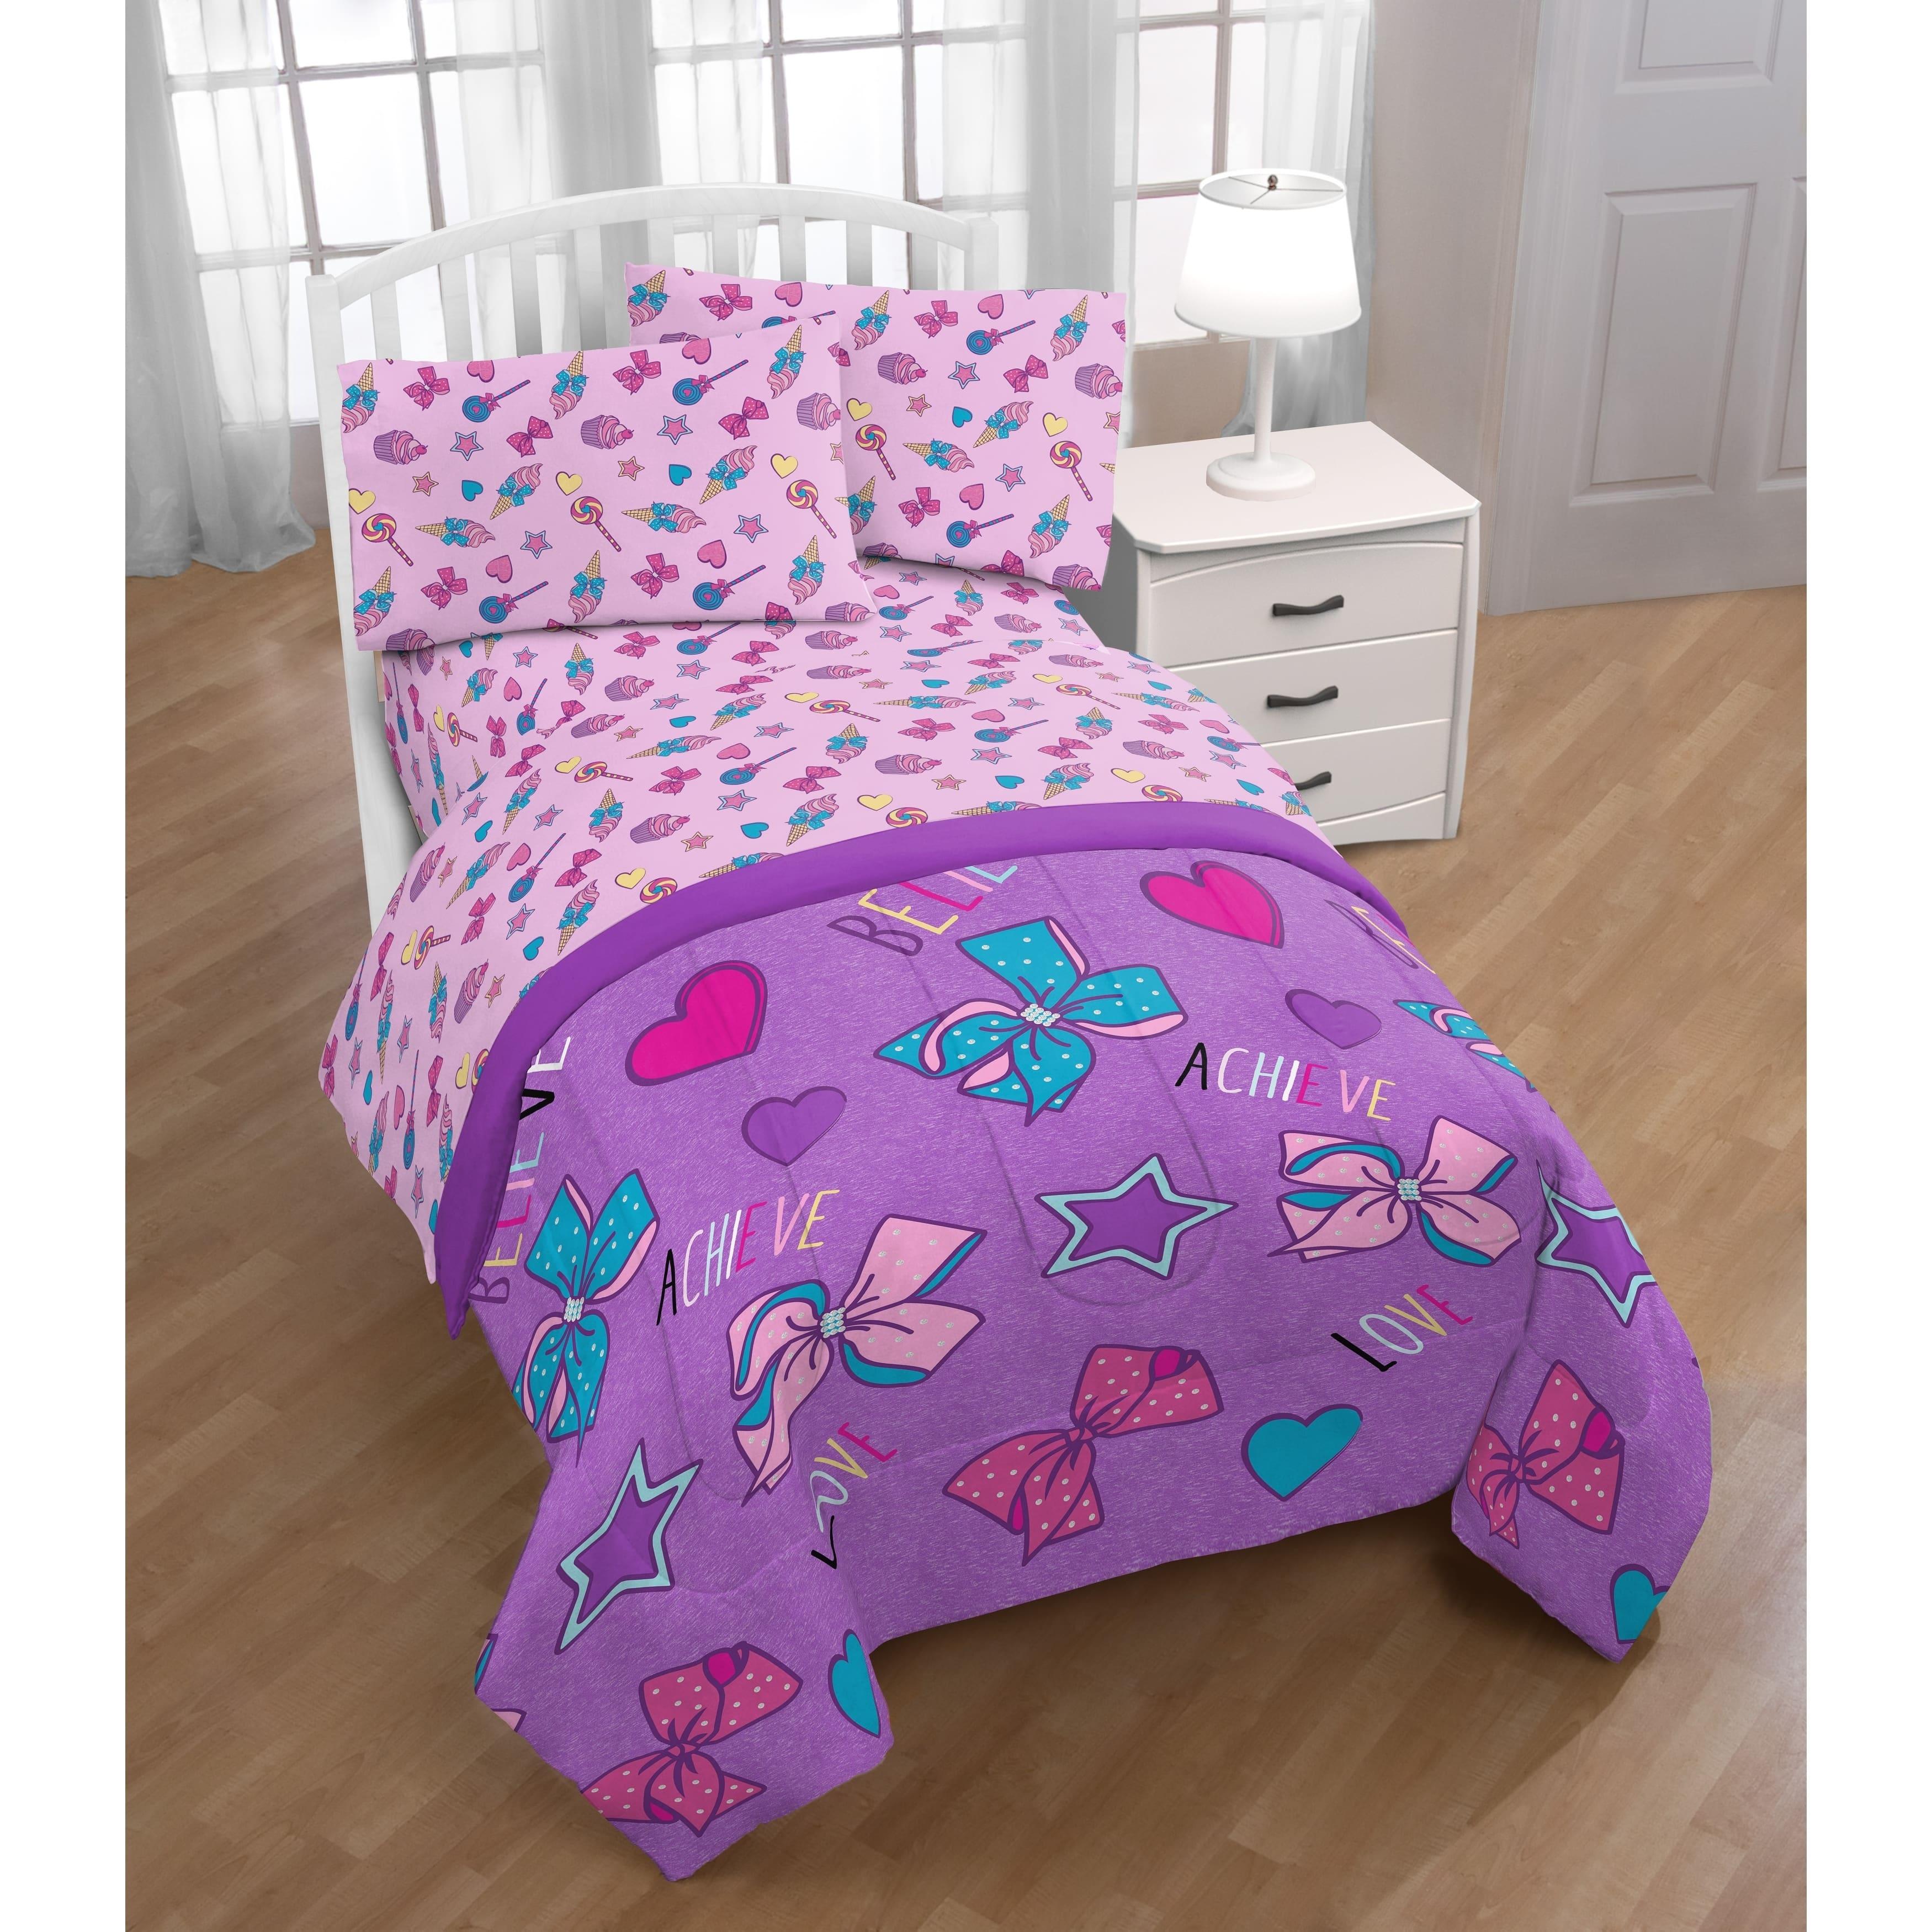 Buy Kids' Comforter Sets Online At Overstock